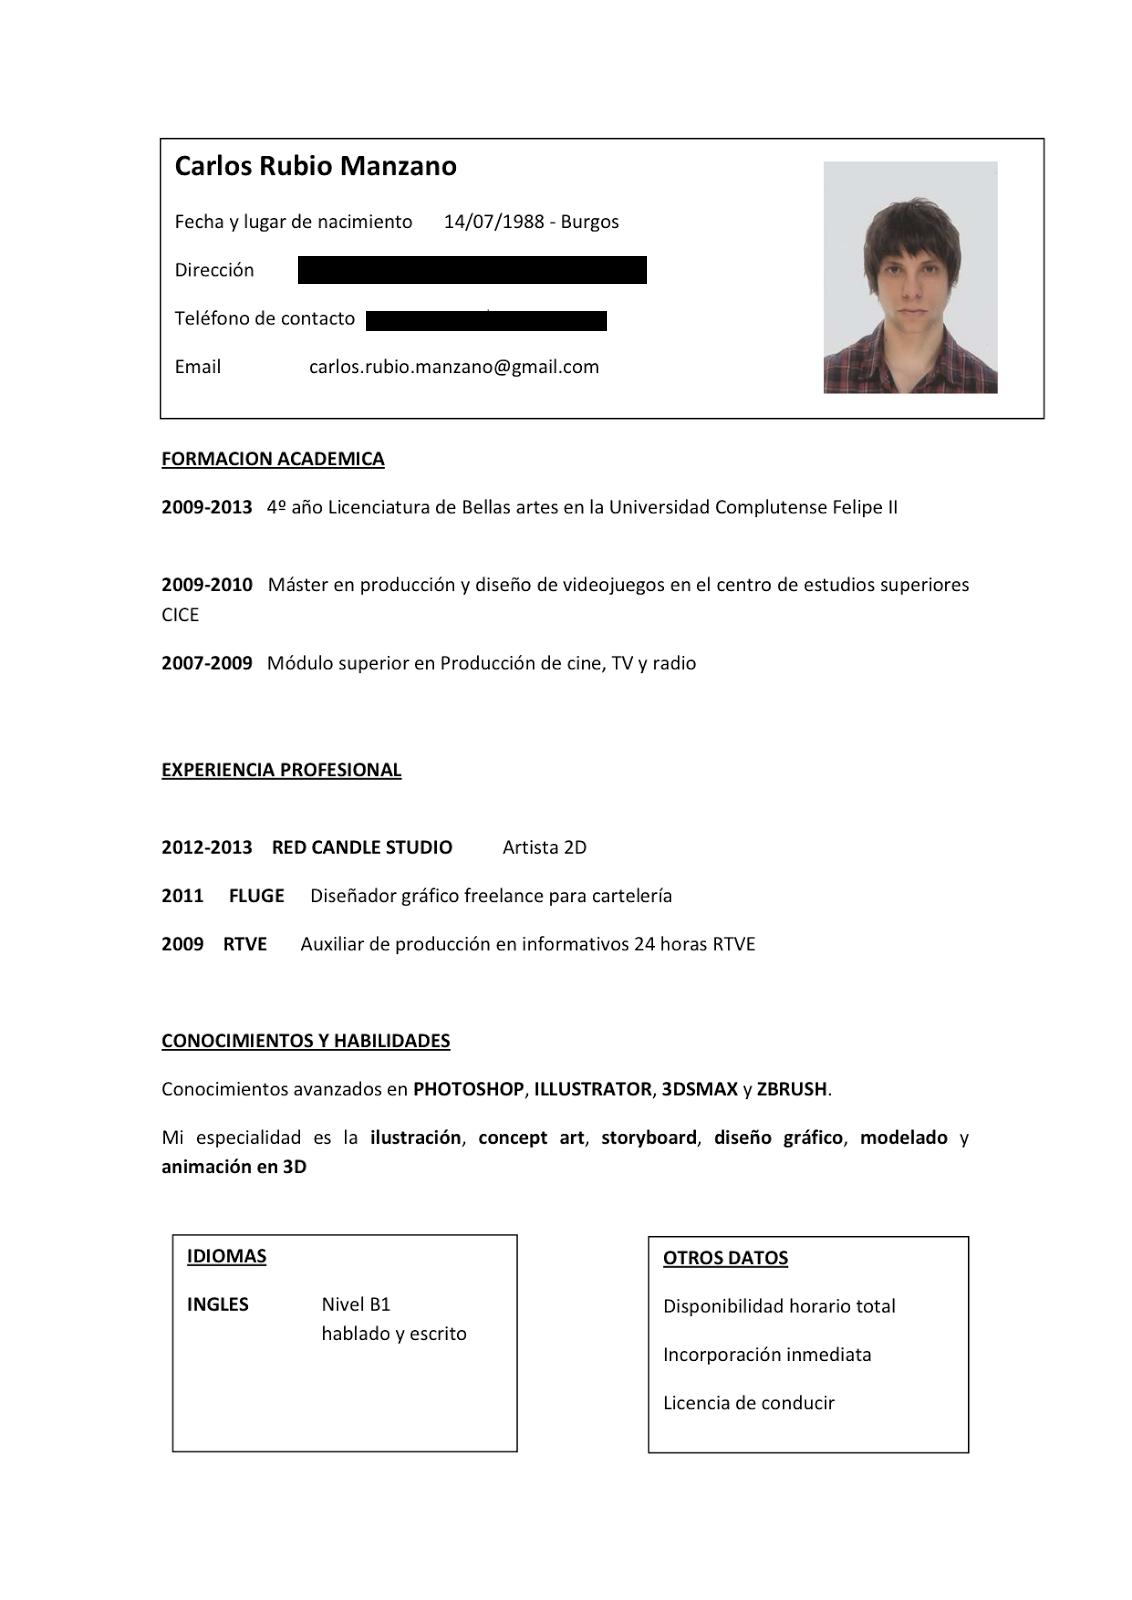 Curriculum Vitae Que Poner En Formacion Academica Lovelyrita